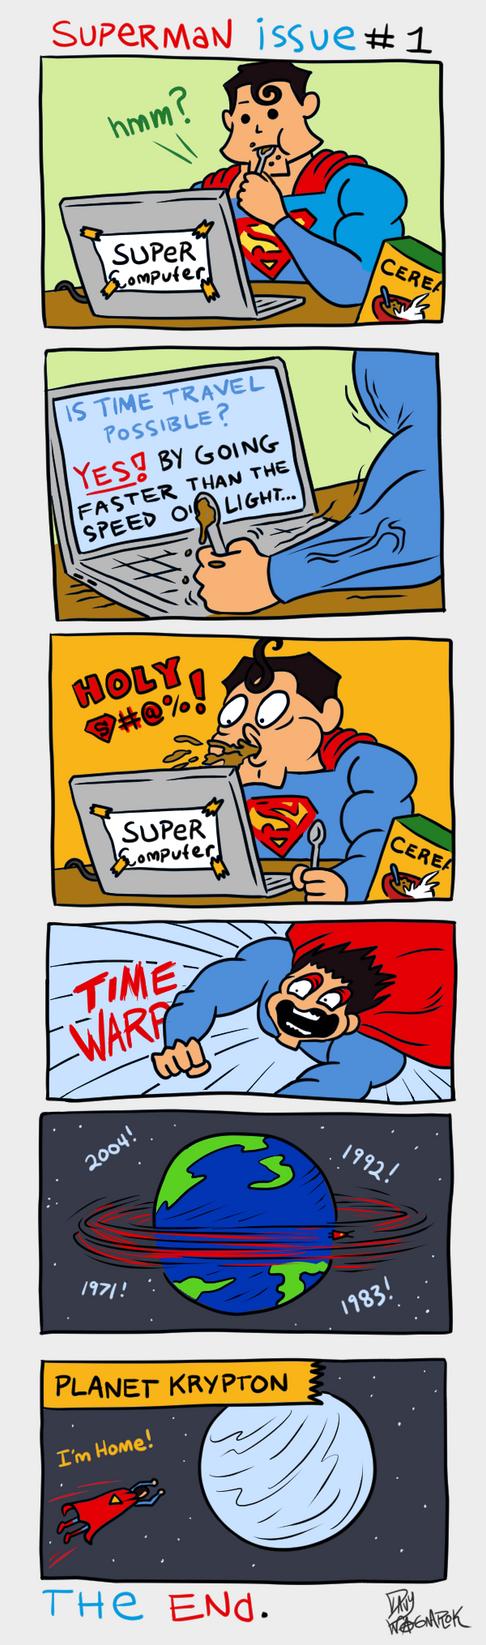 Superman Returns by DavyWagnarok